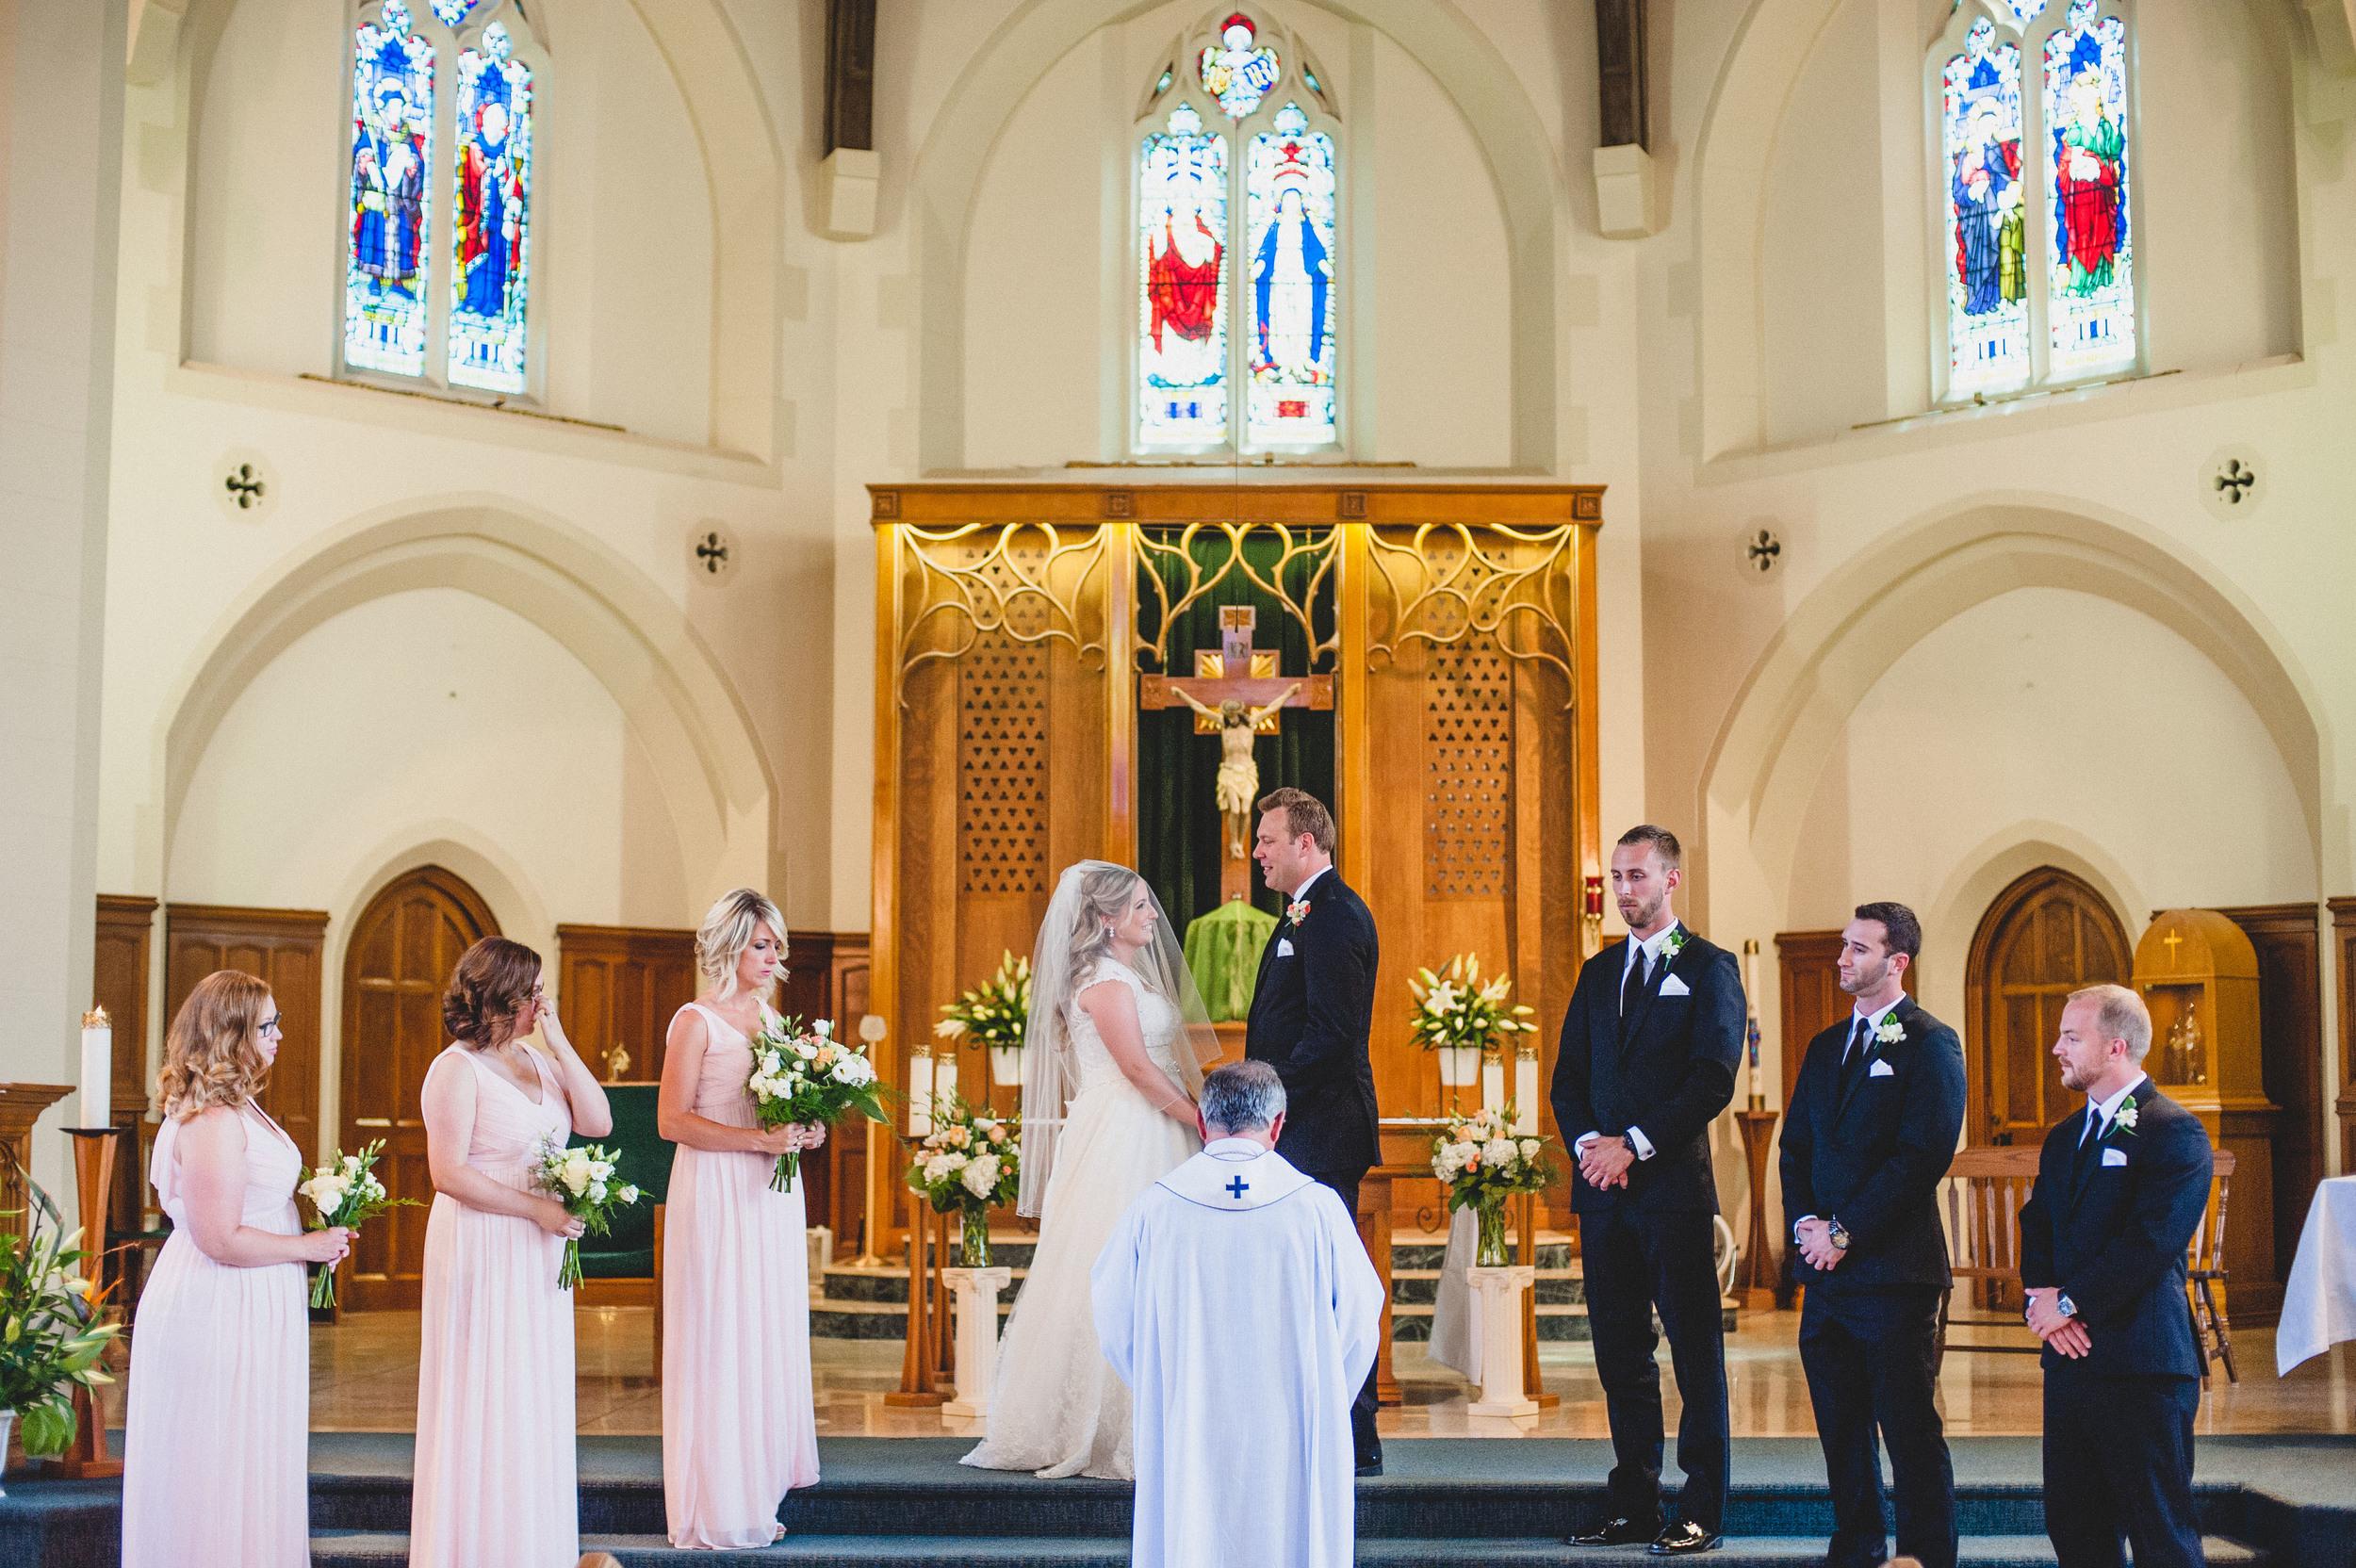 Vancouver St Augustine 's Church wedding photographer edward lai photography-40.jpg